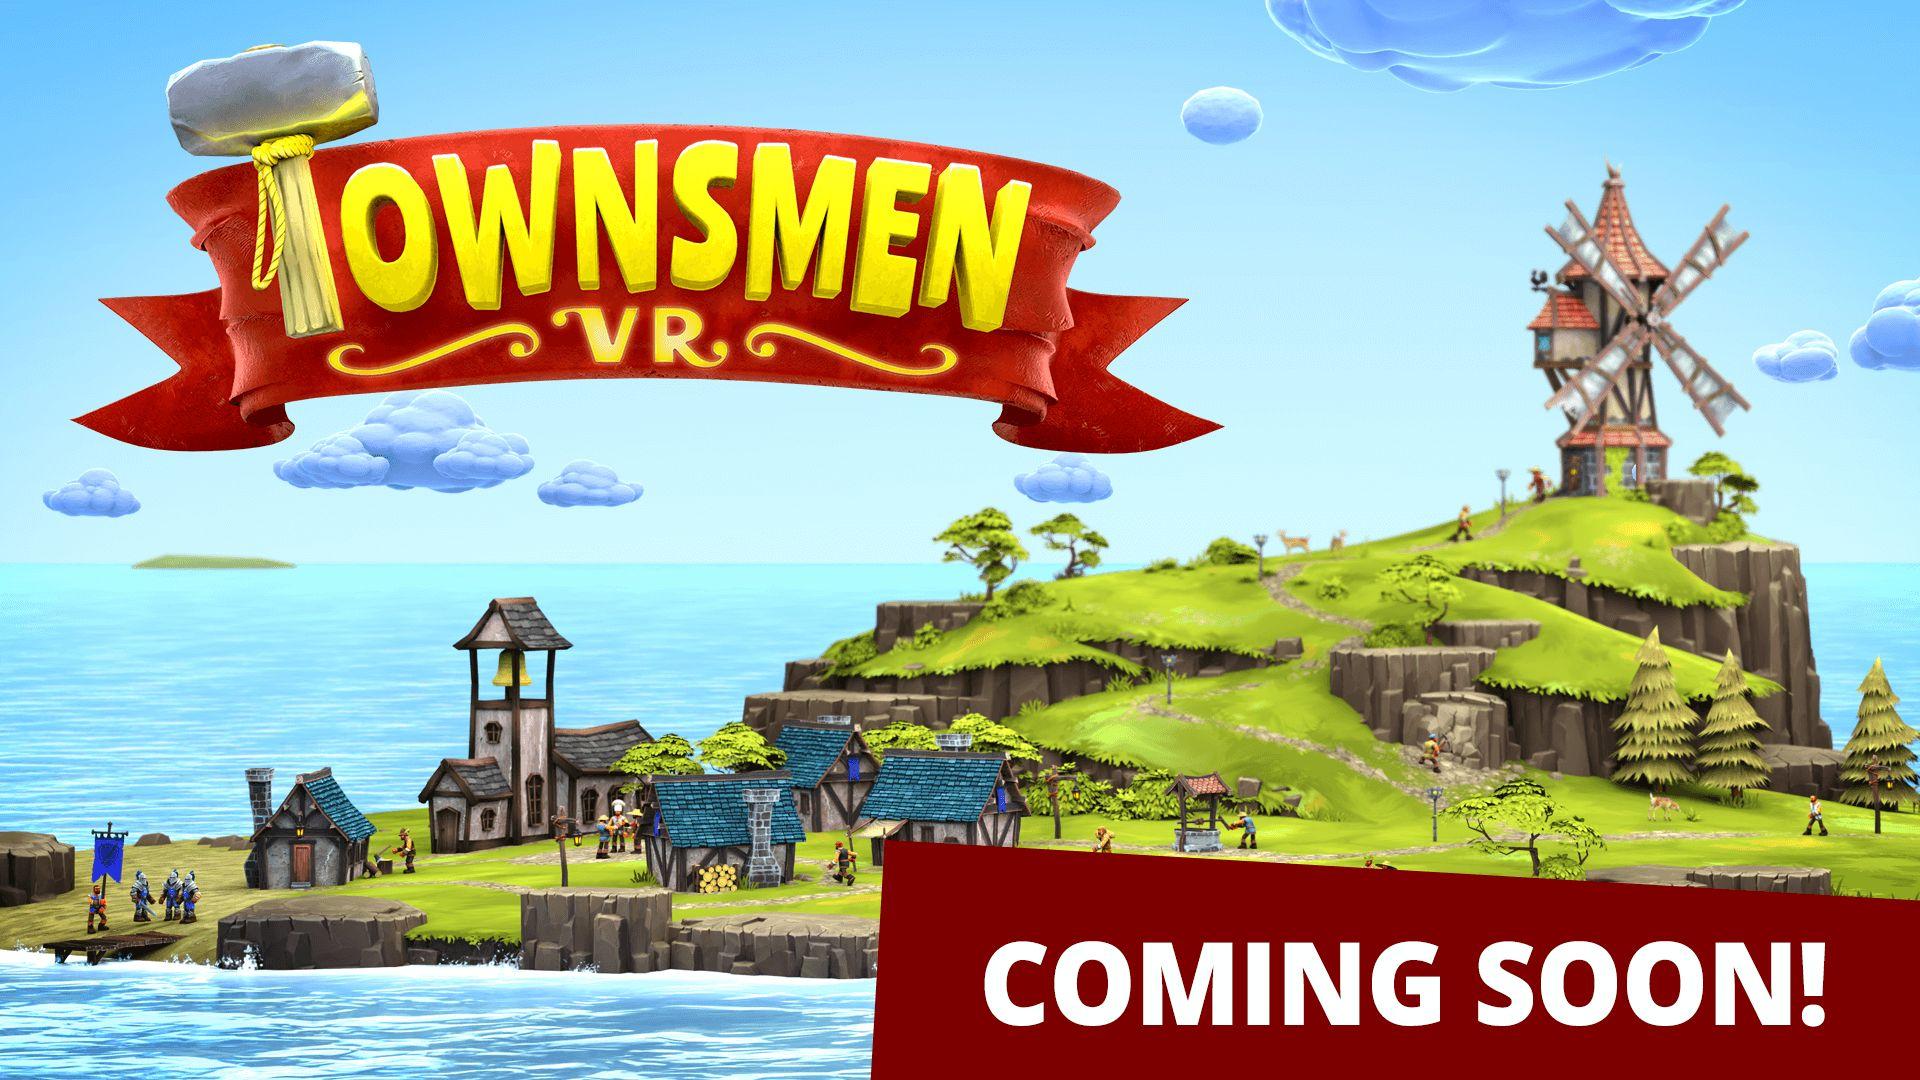 medieval vr townsmen coming soon